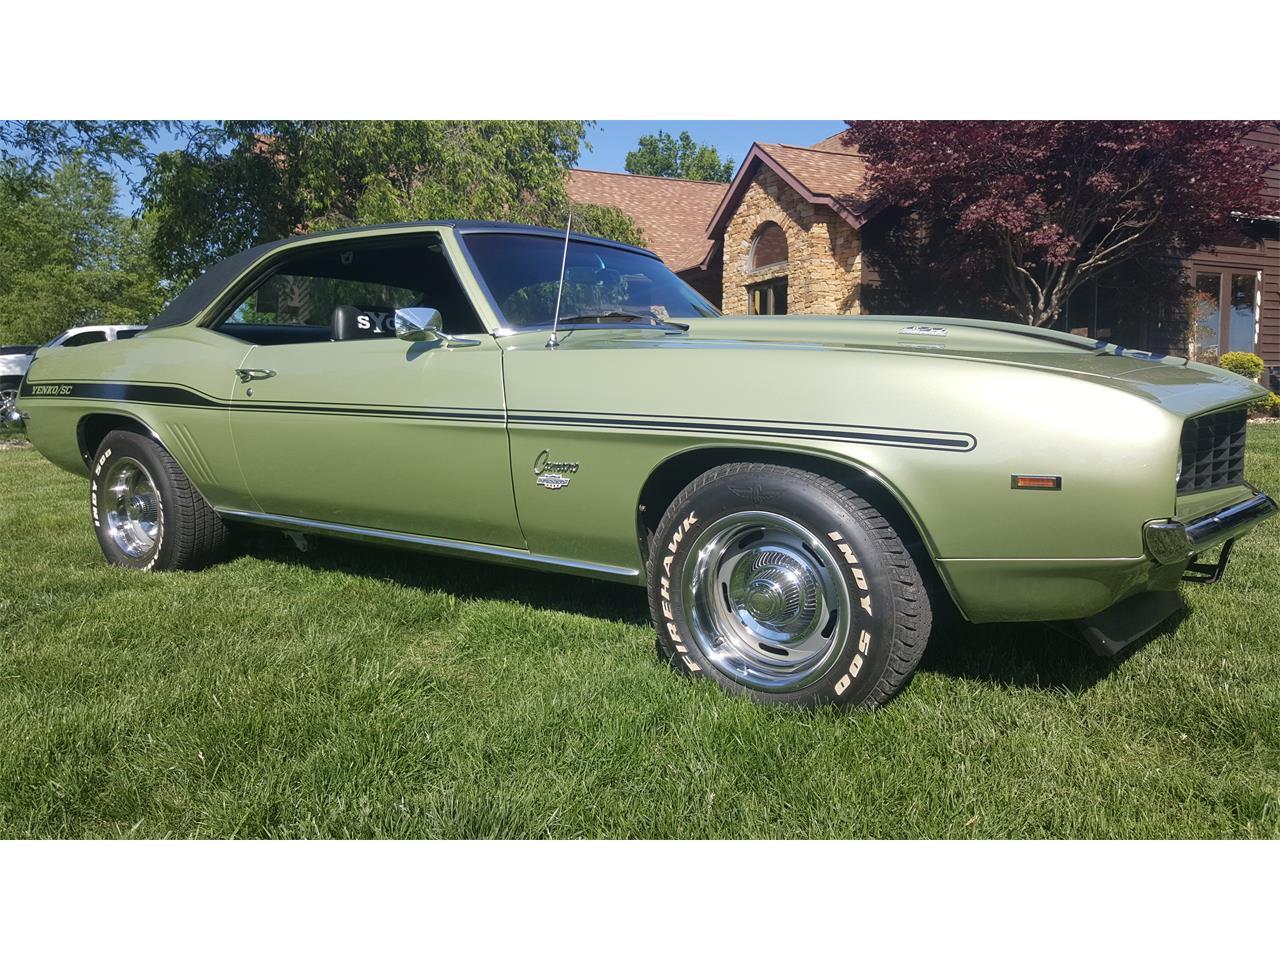 Yenko Camaro For Sale >> For Sale 1969 Chevrolet Camaro Yenko In Bloomington Indiana